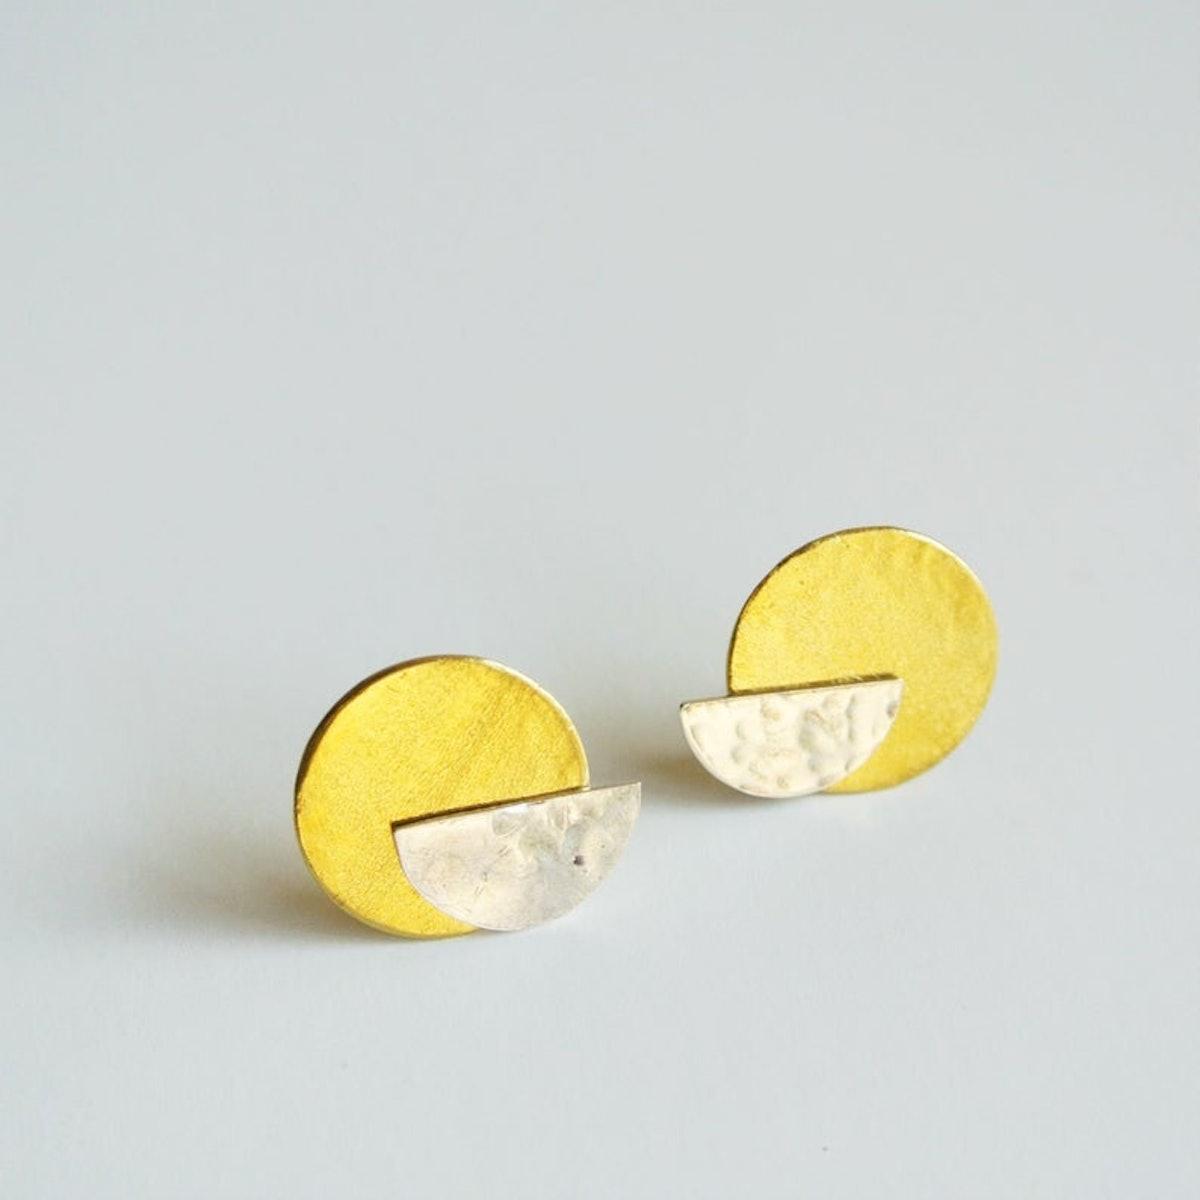 Half Moon Sterling Silver Stud with Gold Brass Disc Ear Jacket Earring - Art Deco